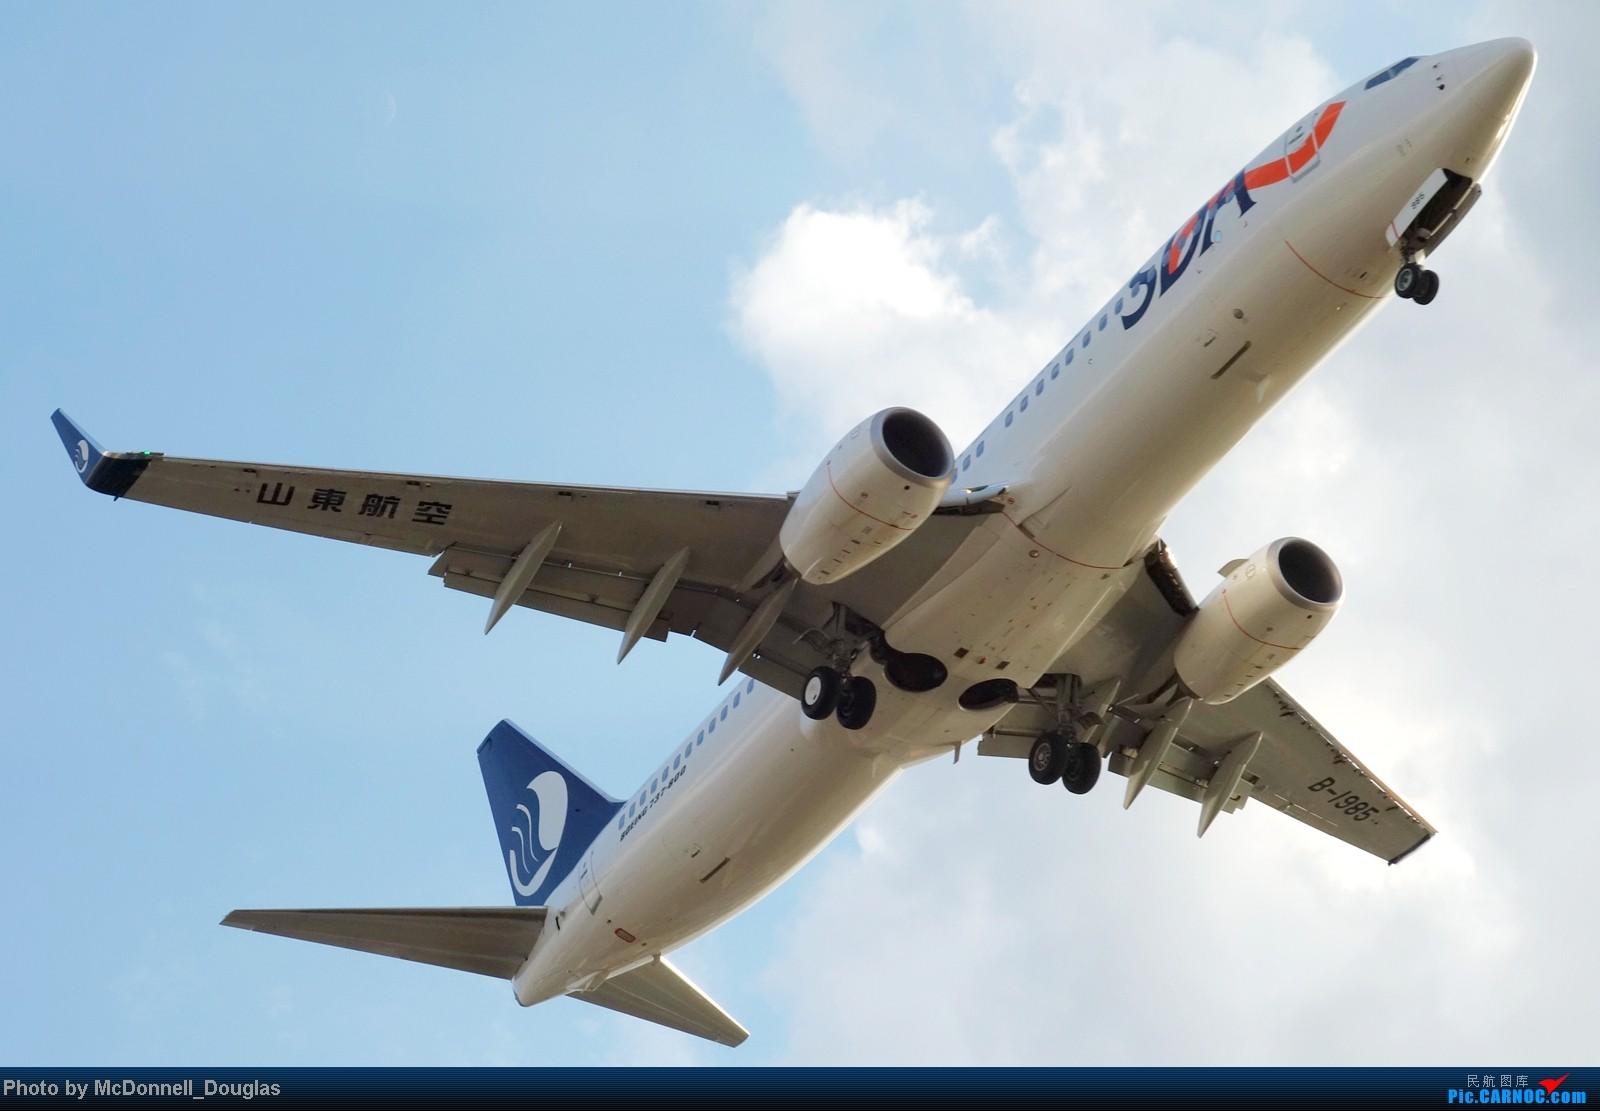 Re:[原创]【上海飞友会】ZSSS杂图一组 BOEING 737-800 B-1985 中国上海虹桥机场